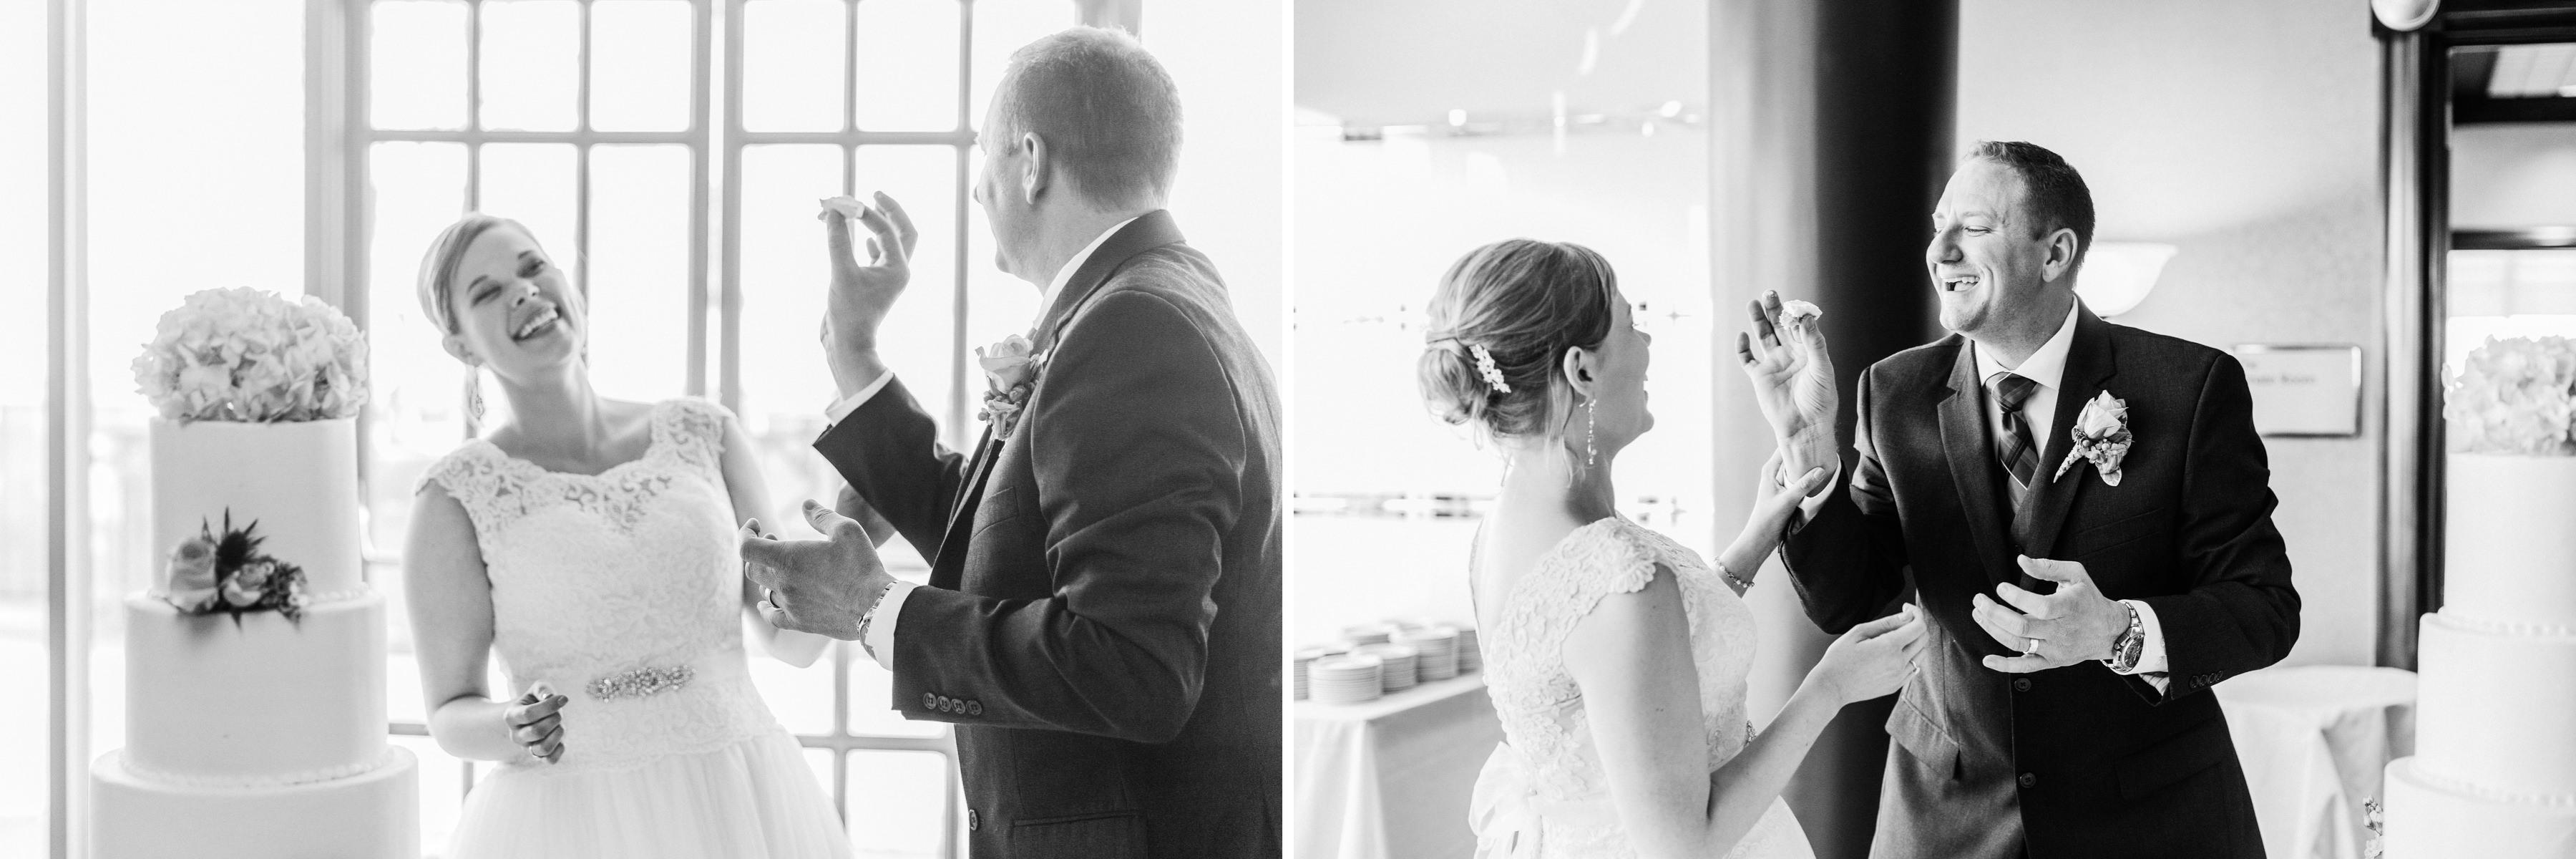 MAULDIN_WEDDING_MONTGOMERY_ALABAMA_WEDDING_PHOTOGRAPHY_112